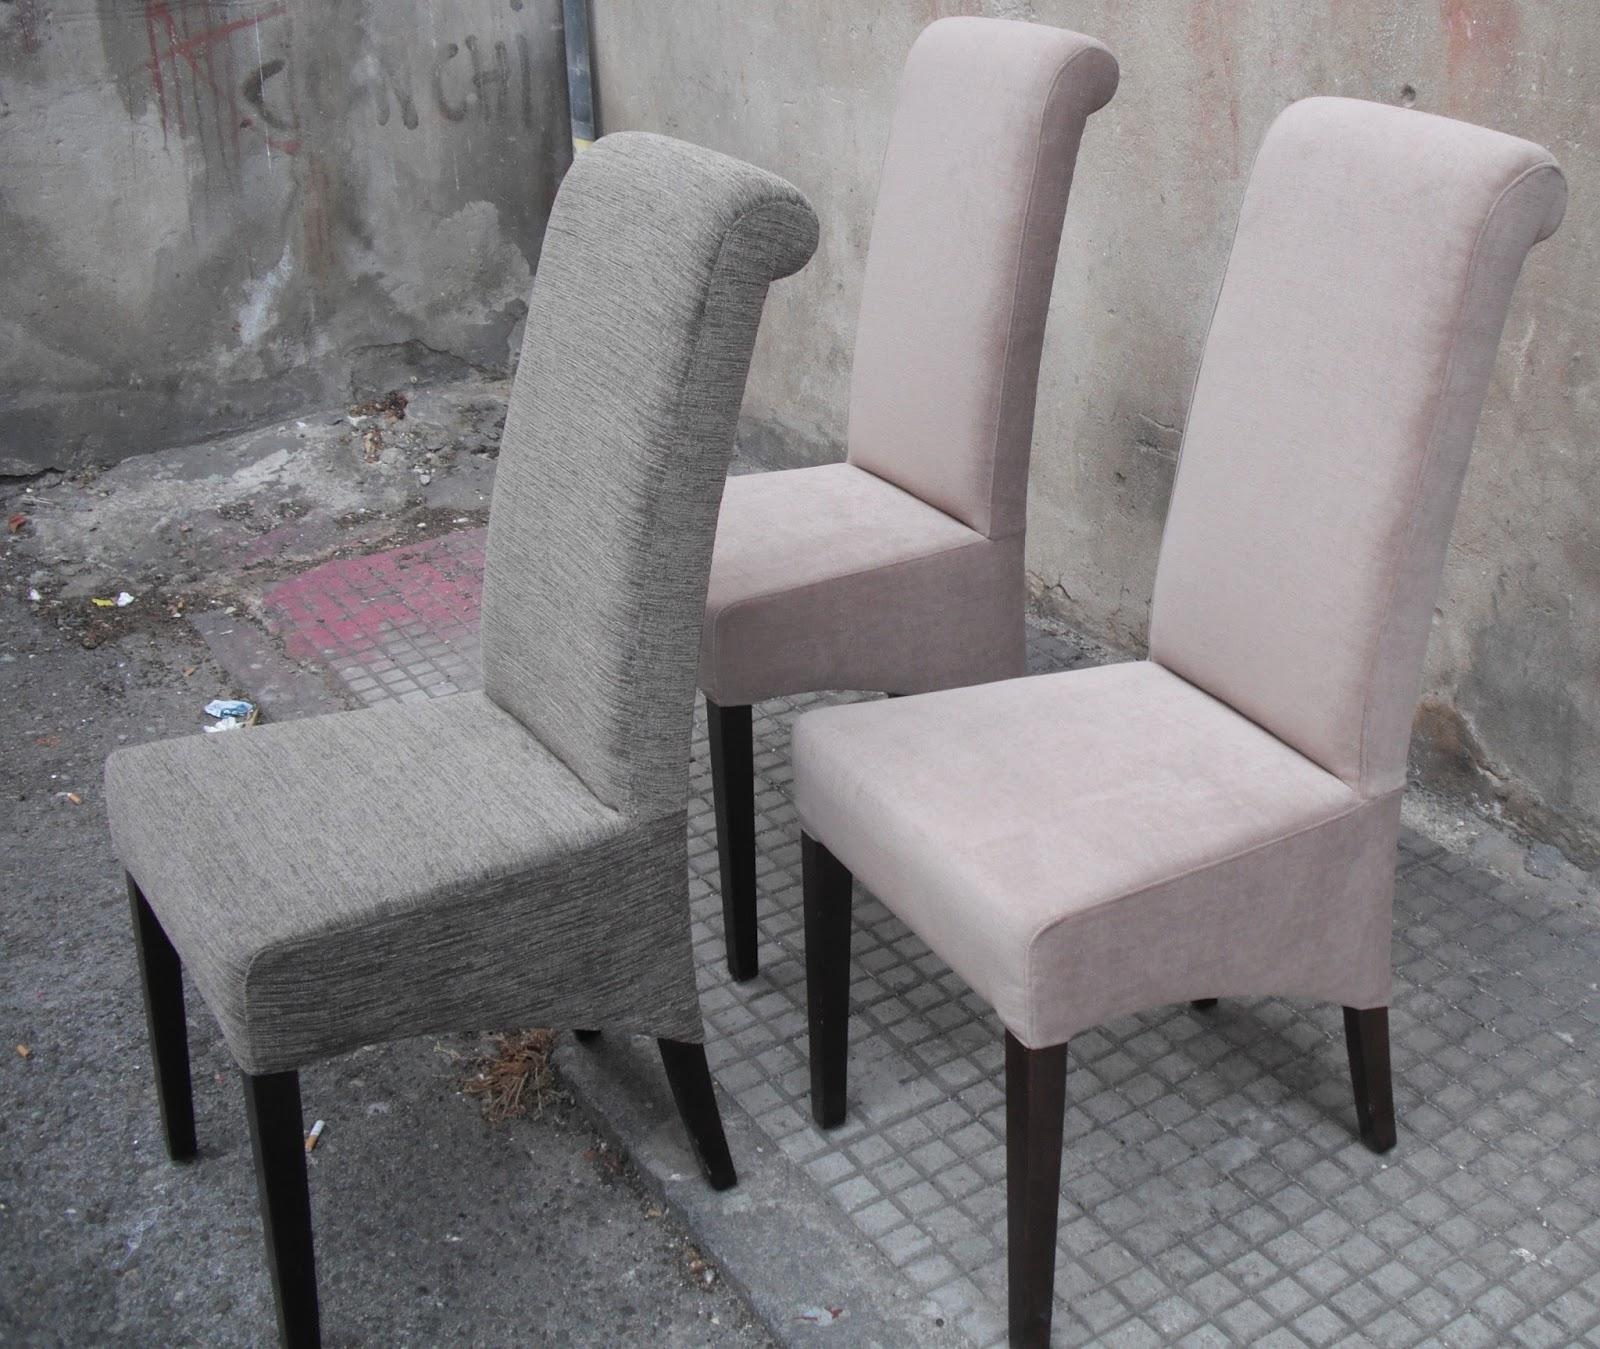 Tapicer a chiqui 6 sillas 6 de comedor for Telas tapizar sillas comedor